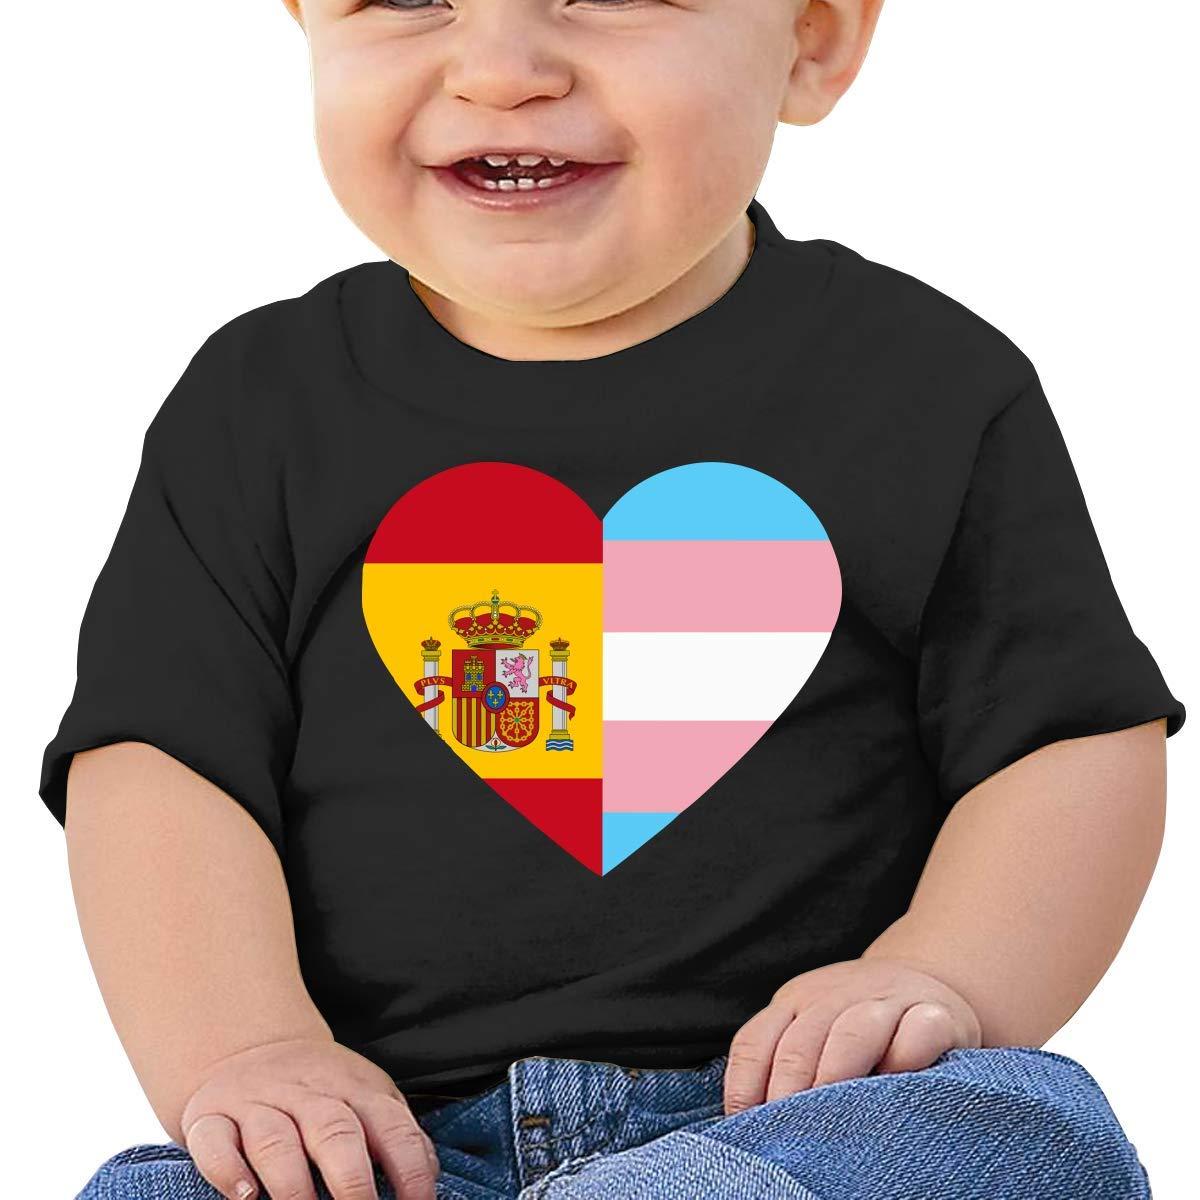 STARKLY Australian Flag Soccer Football11 Baby Boy Newborn Short Sleeve Tee Shirt 6-24 Month 5 Tops